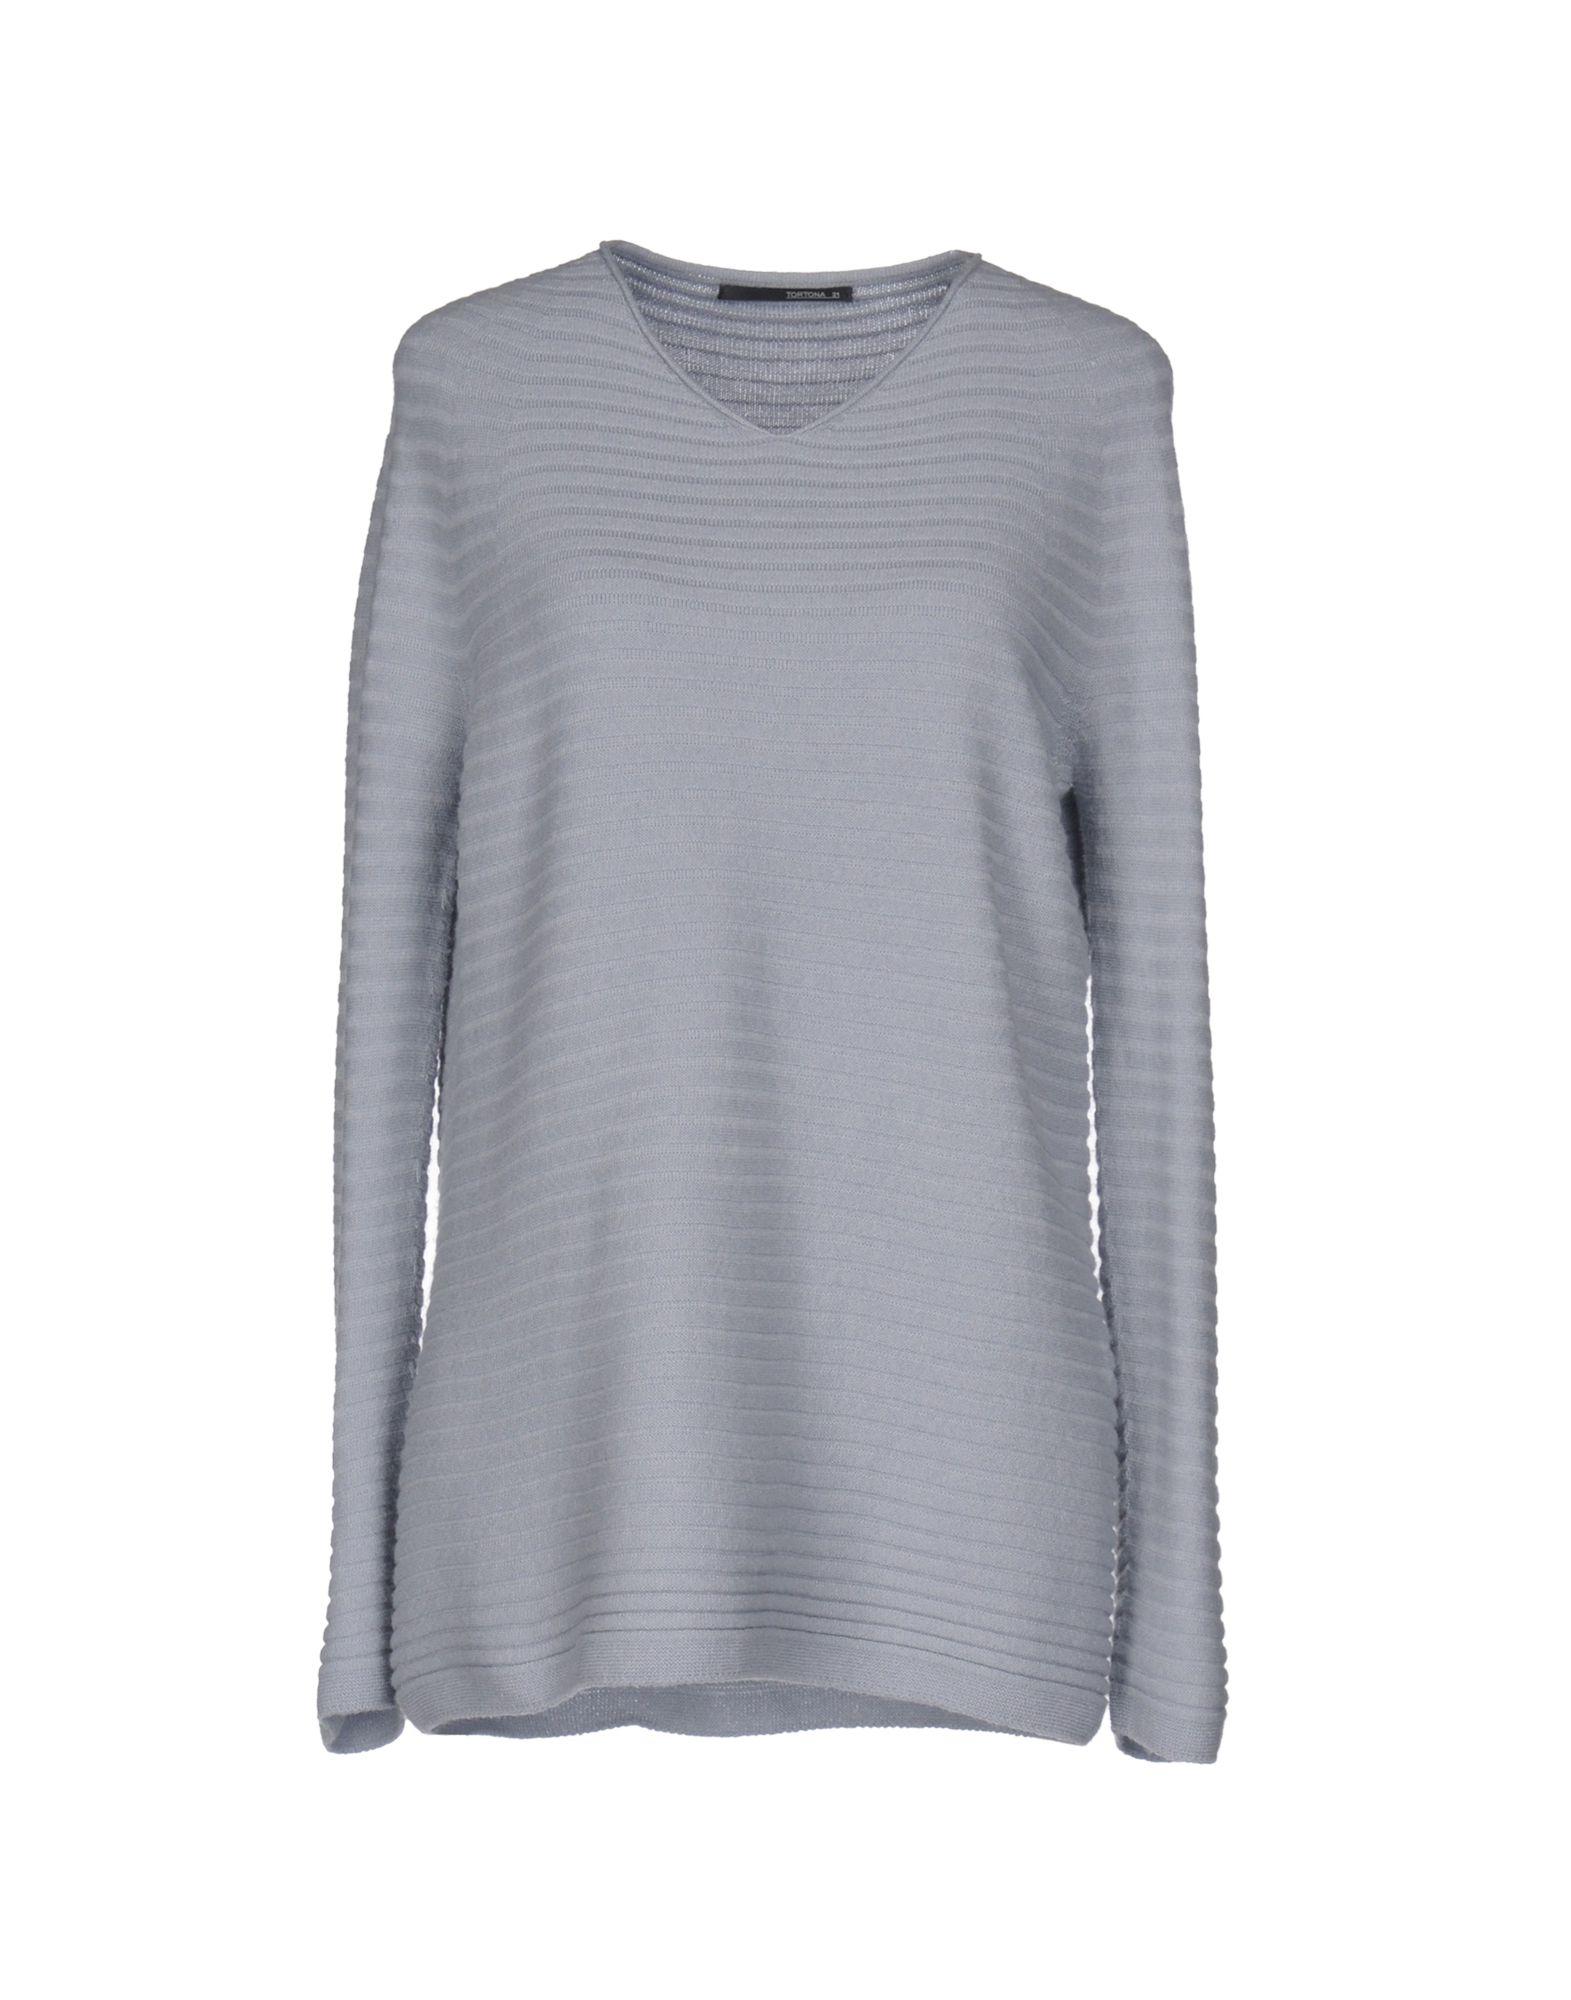 TORTONA 21 Damen Pullover Farbe Himmelblau Größe 5